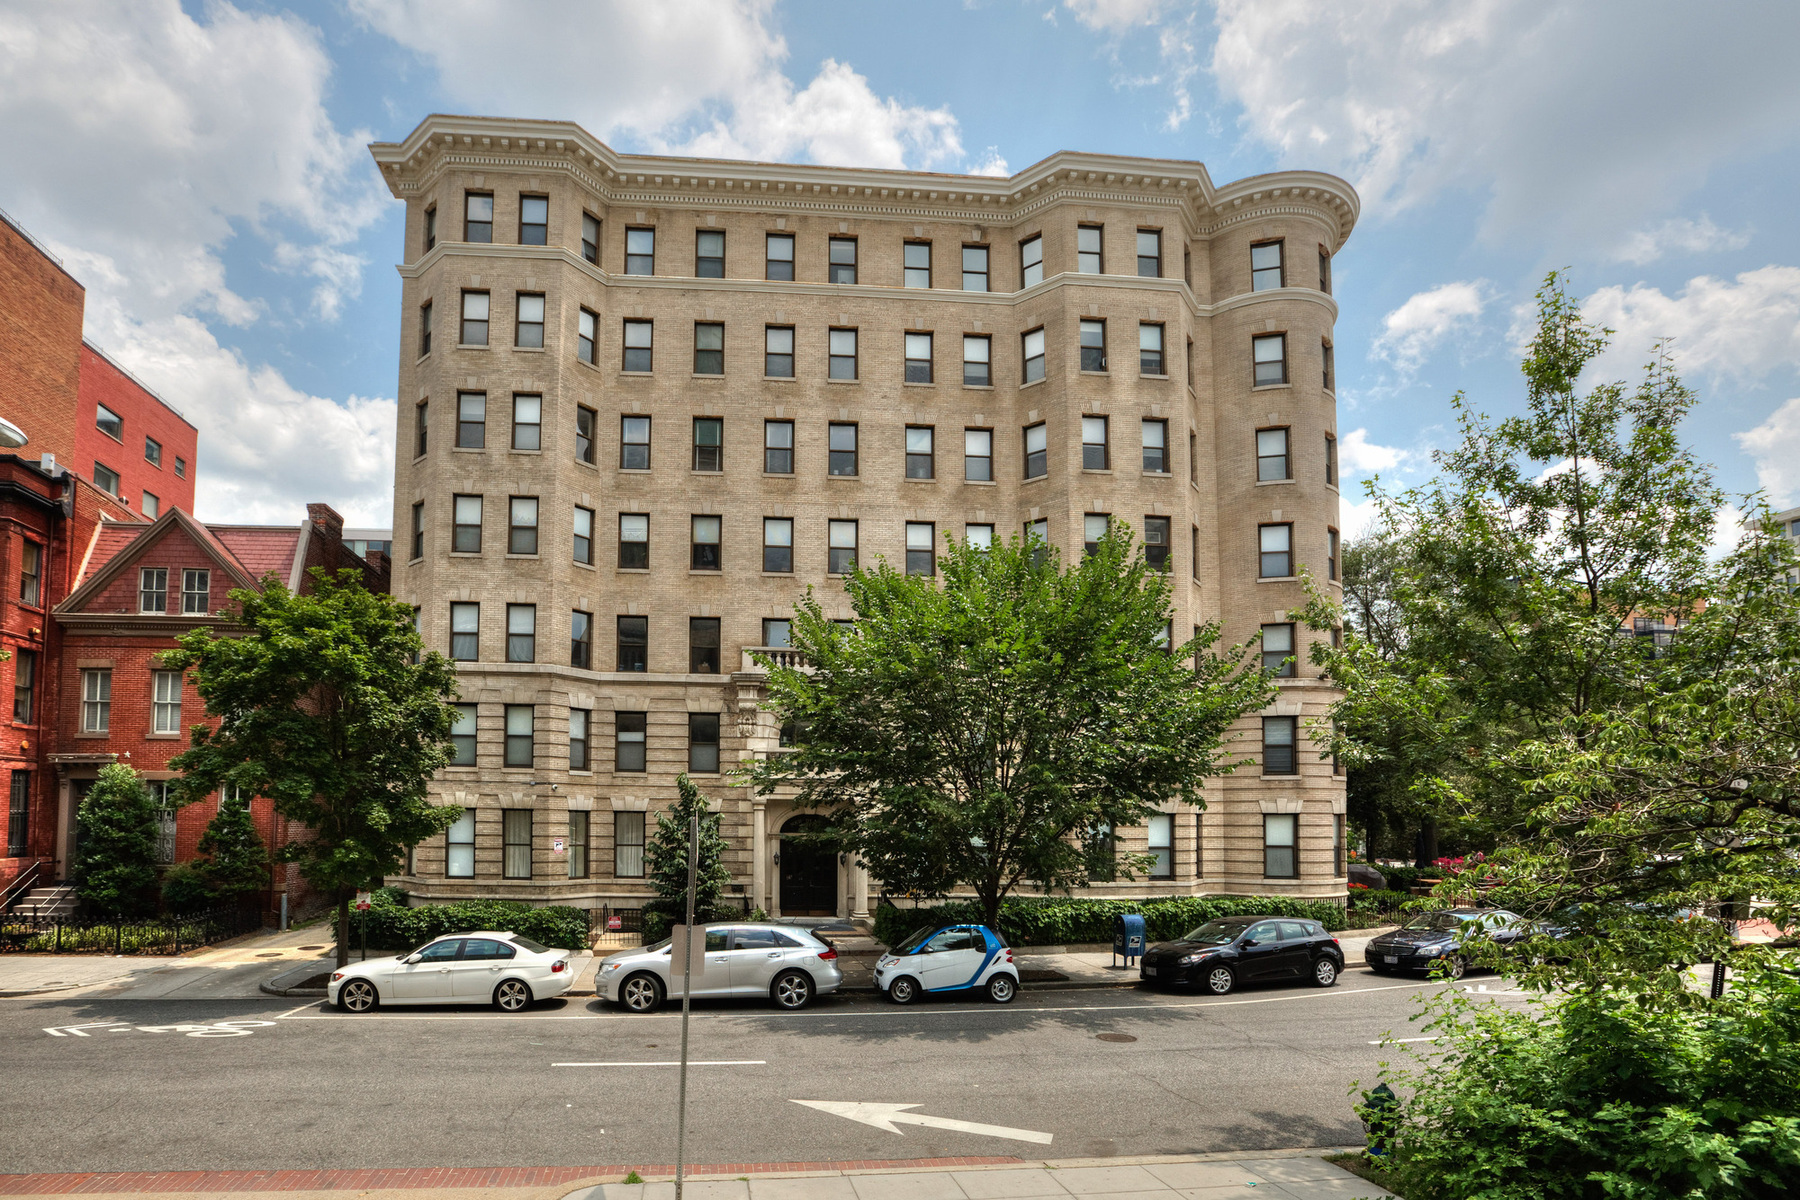 Condominium for Sale at 1115 12th Street Nw 604, Washington Washington, District Of Columbia 20005 United States